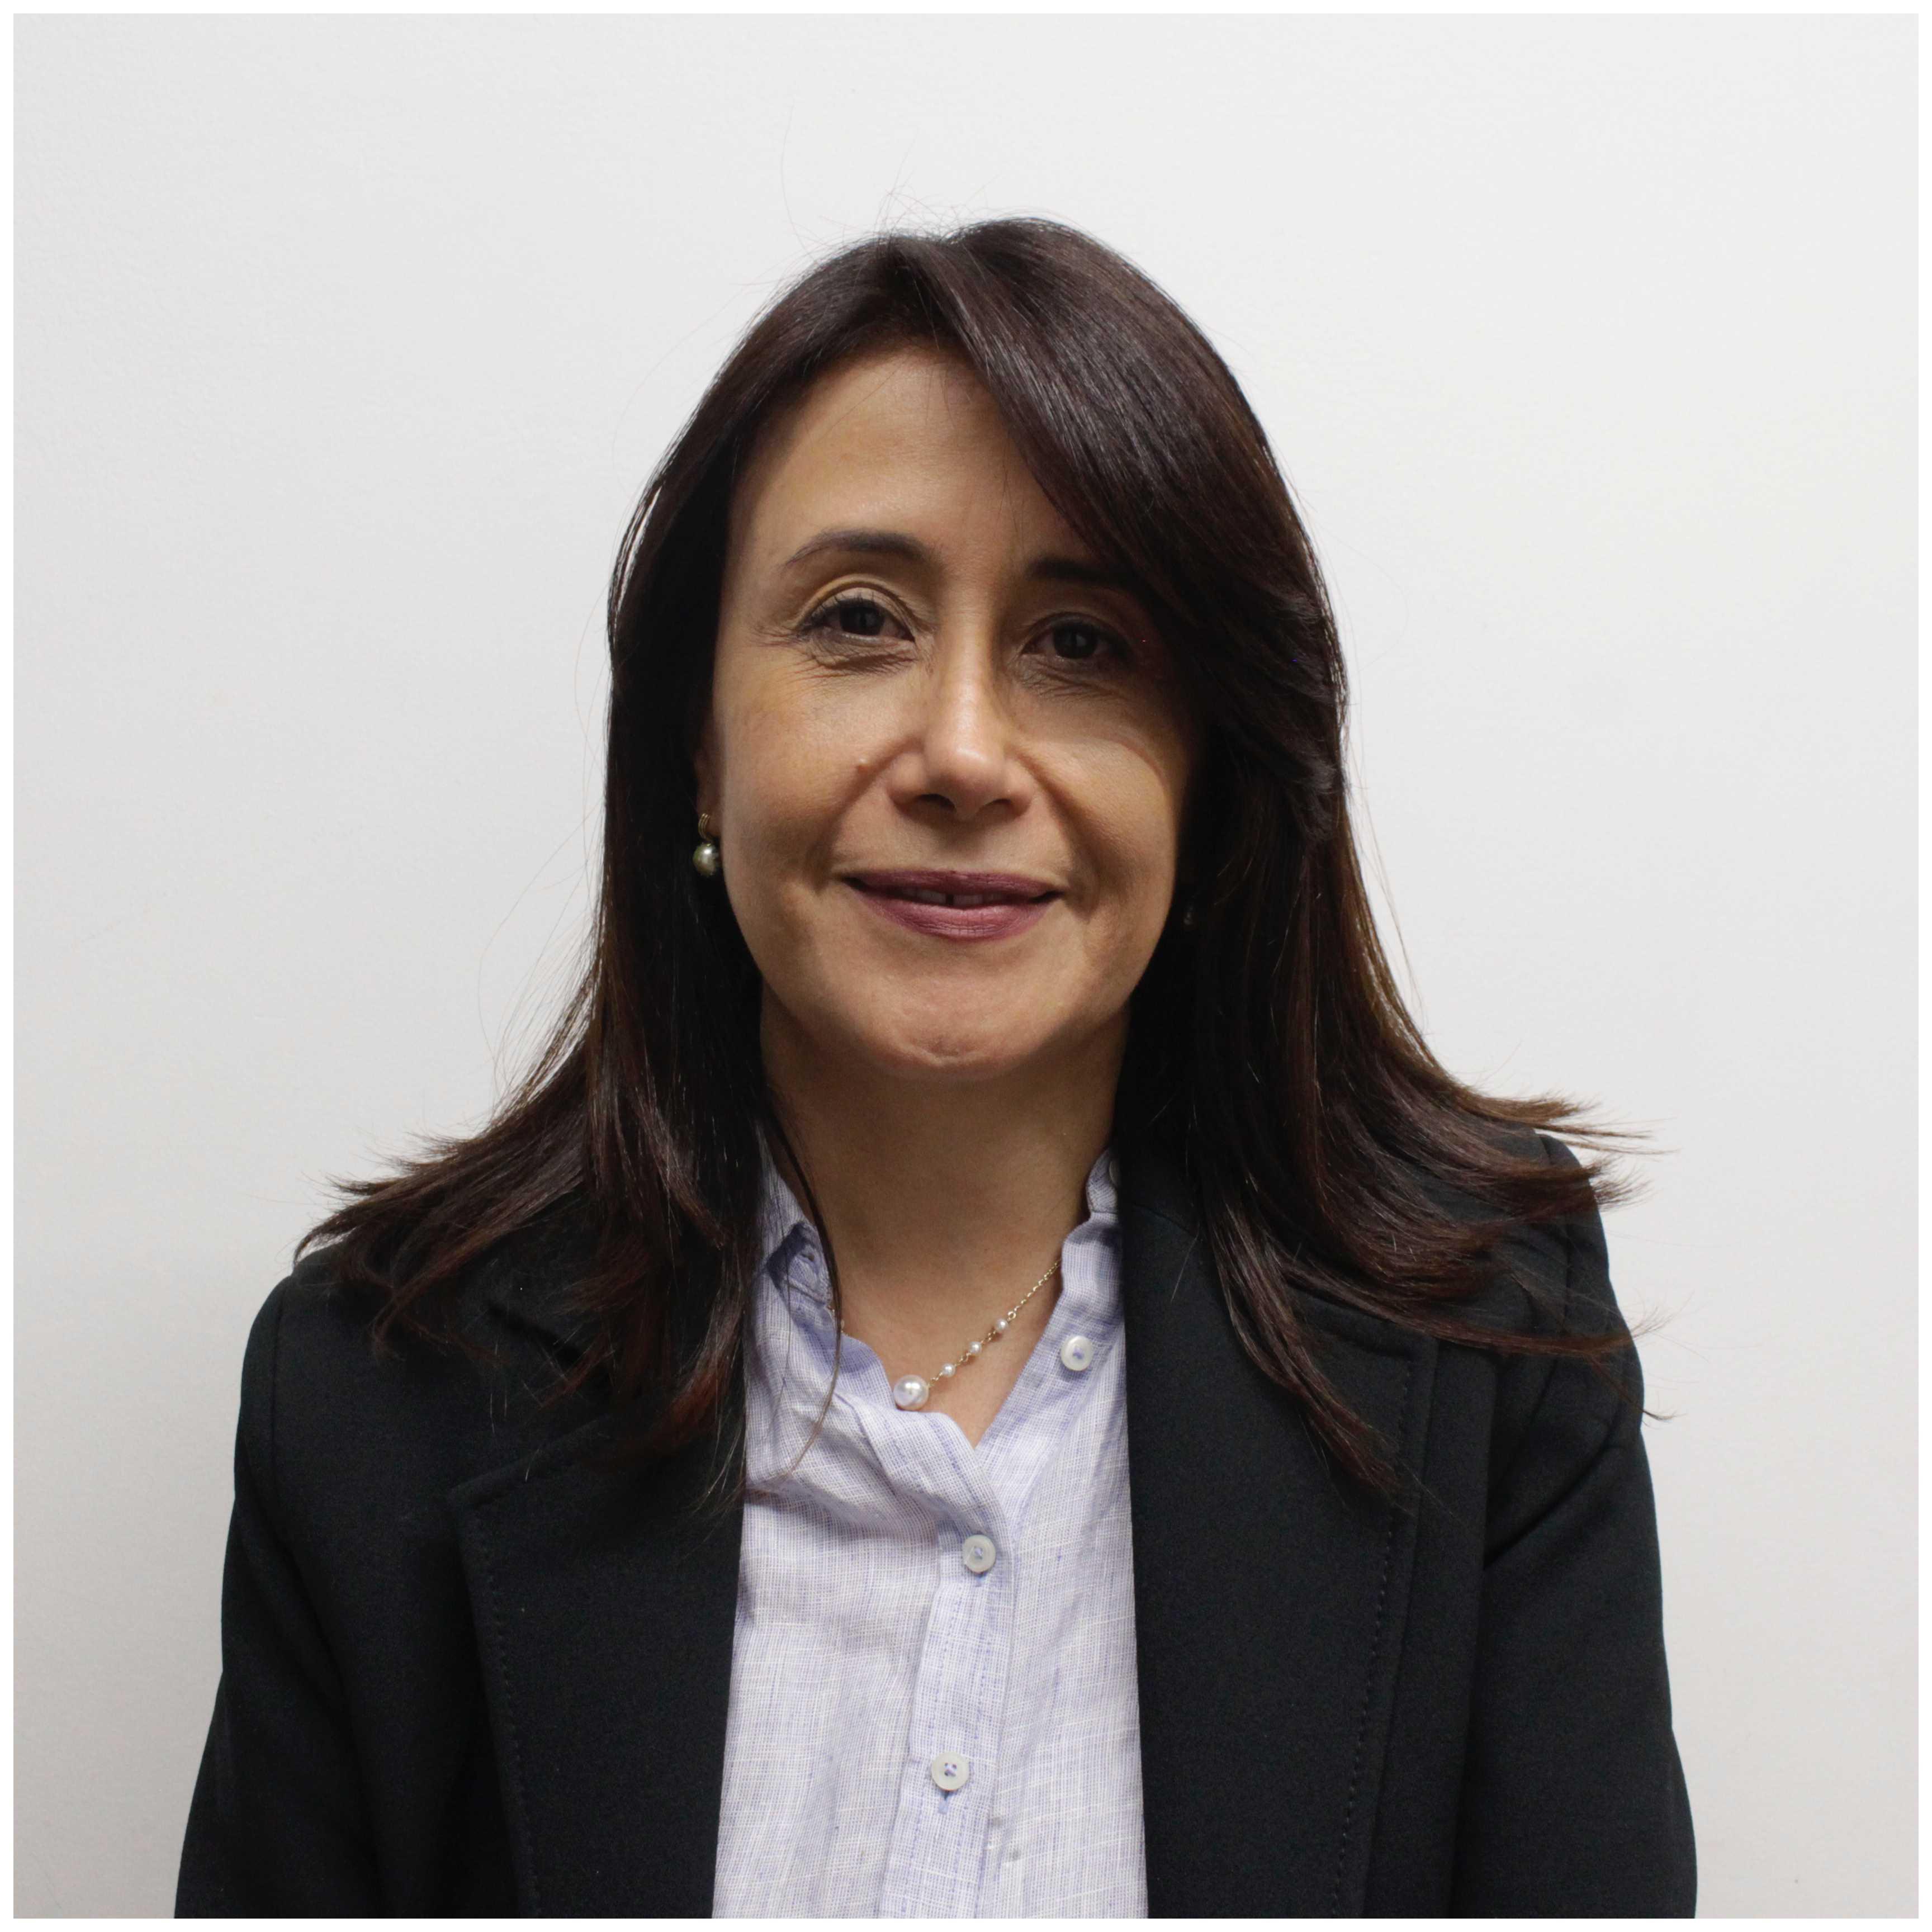 Magda León